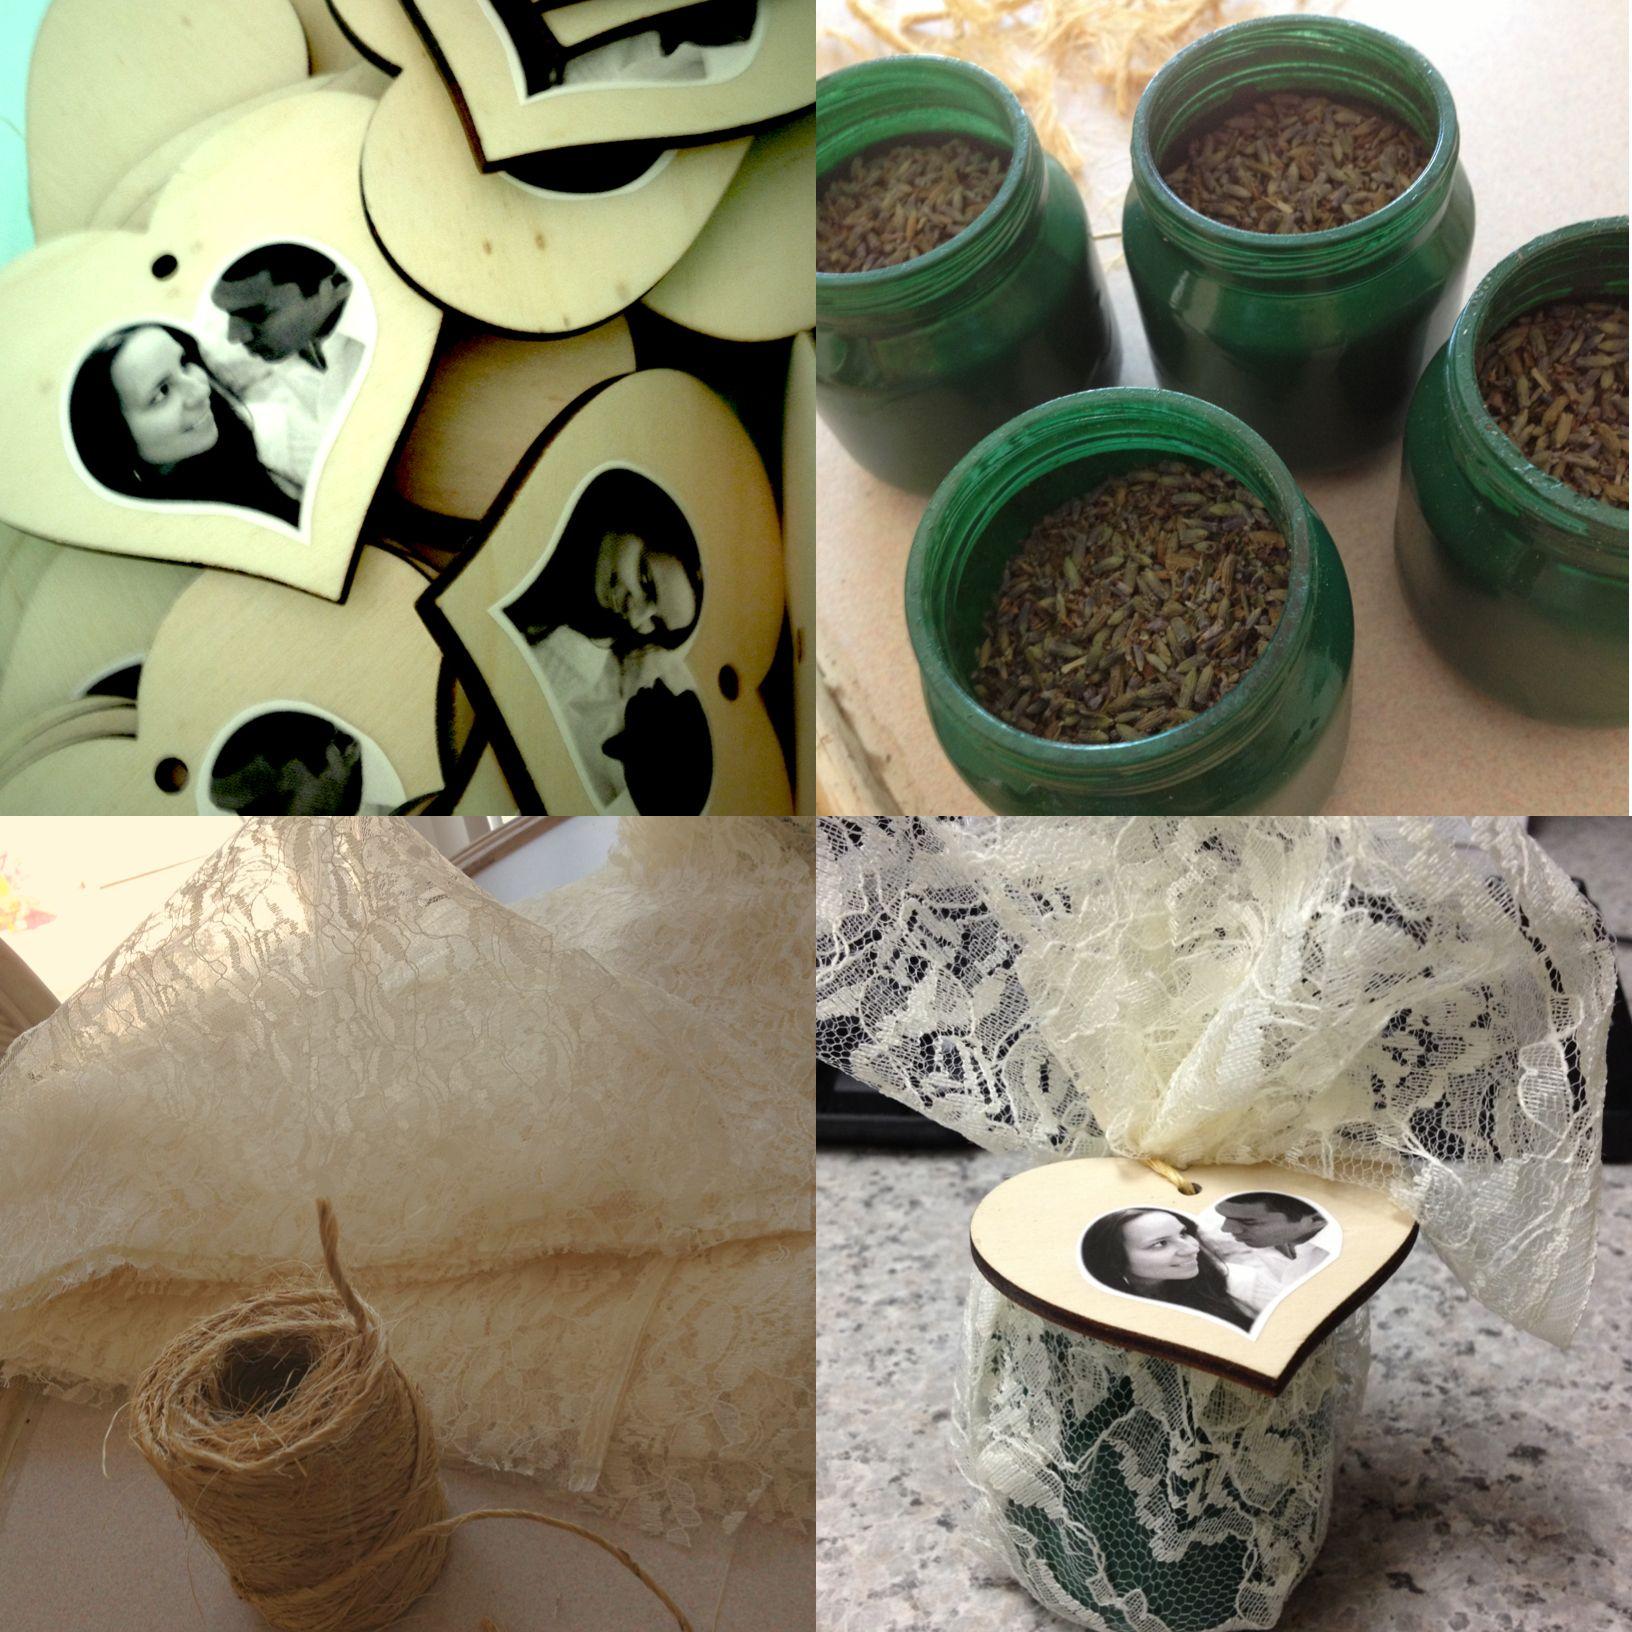 Diy Food For Wedding: DIY Wedding/party Favors: Made With Baby Food Jars, Spray